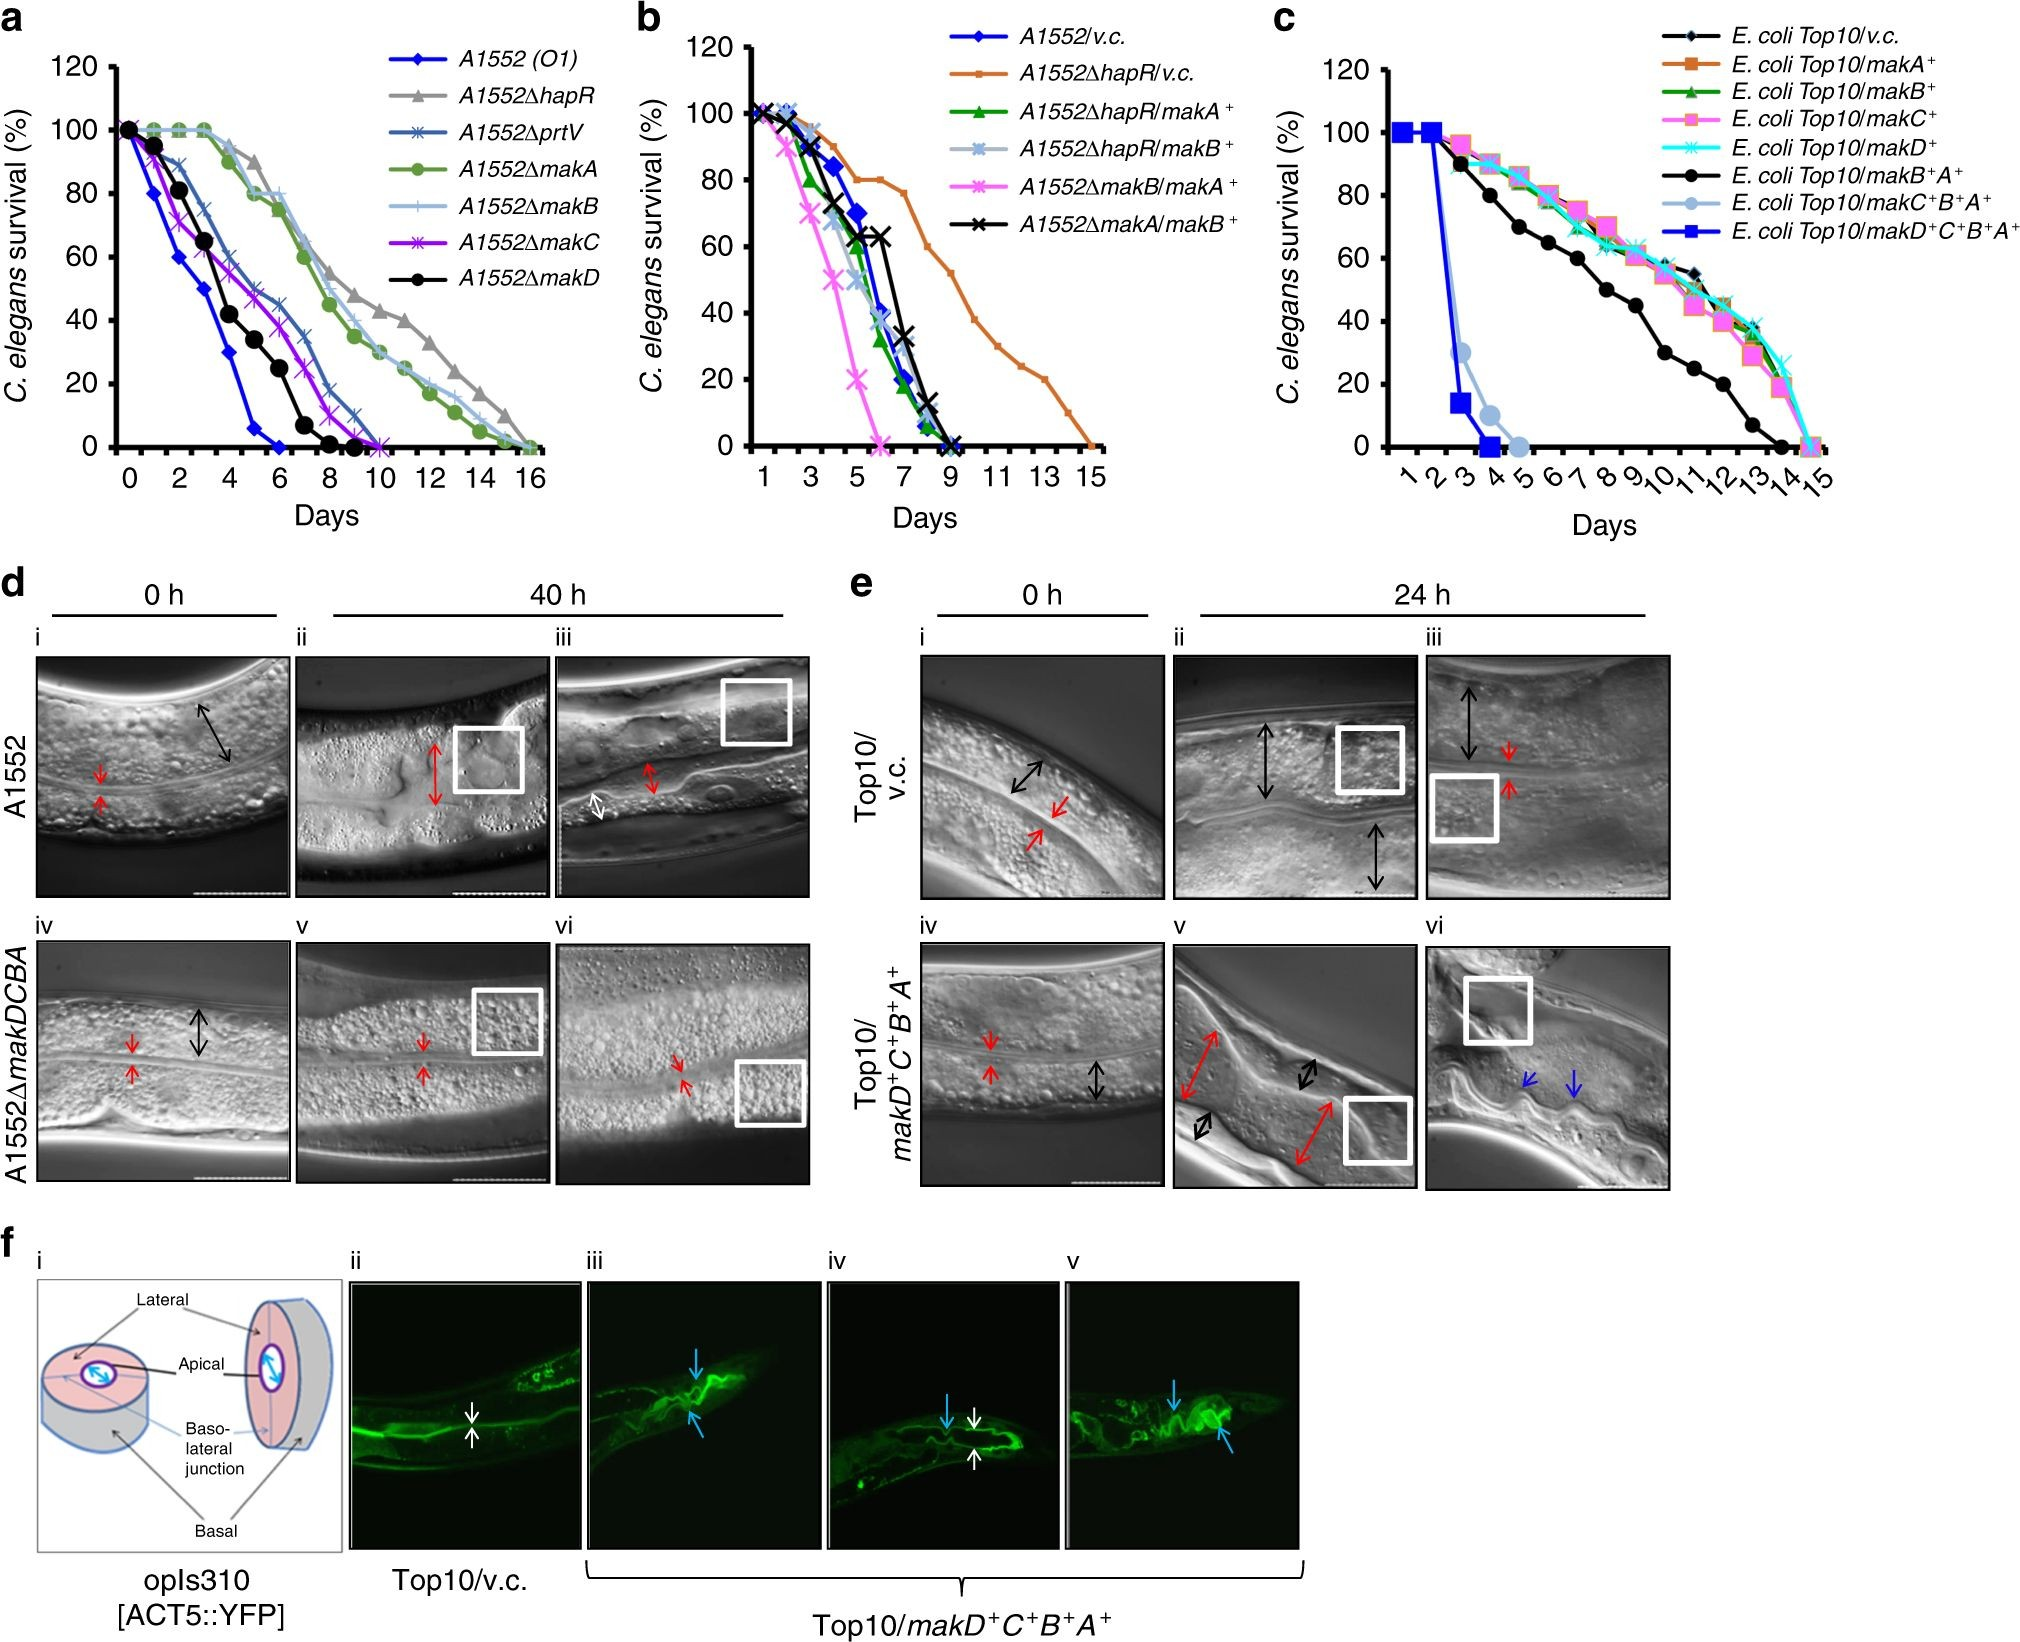 Indicator Diagram Of 2 Stroke Engine Flagella Mediated Secretion Of A Novel Vibrio Cholerae Cytotoxin Of Indicator Diagram Of 2 Stroke Engine